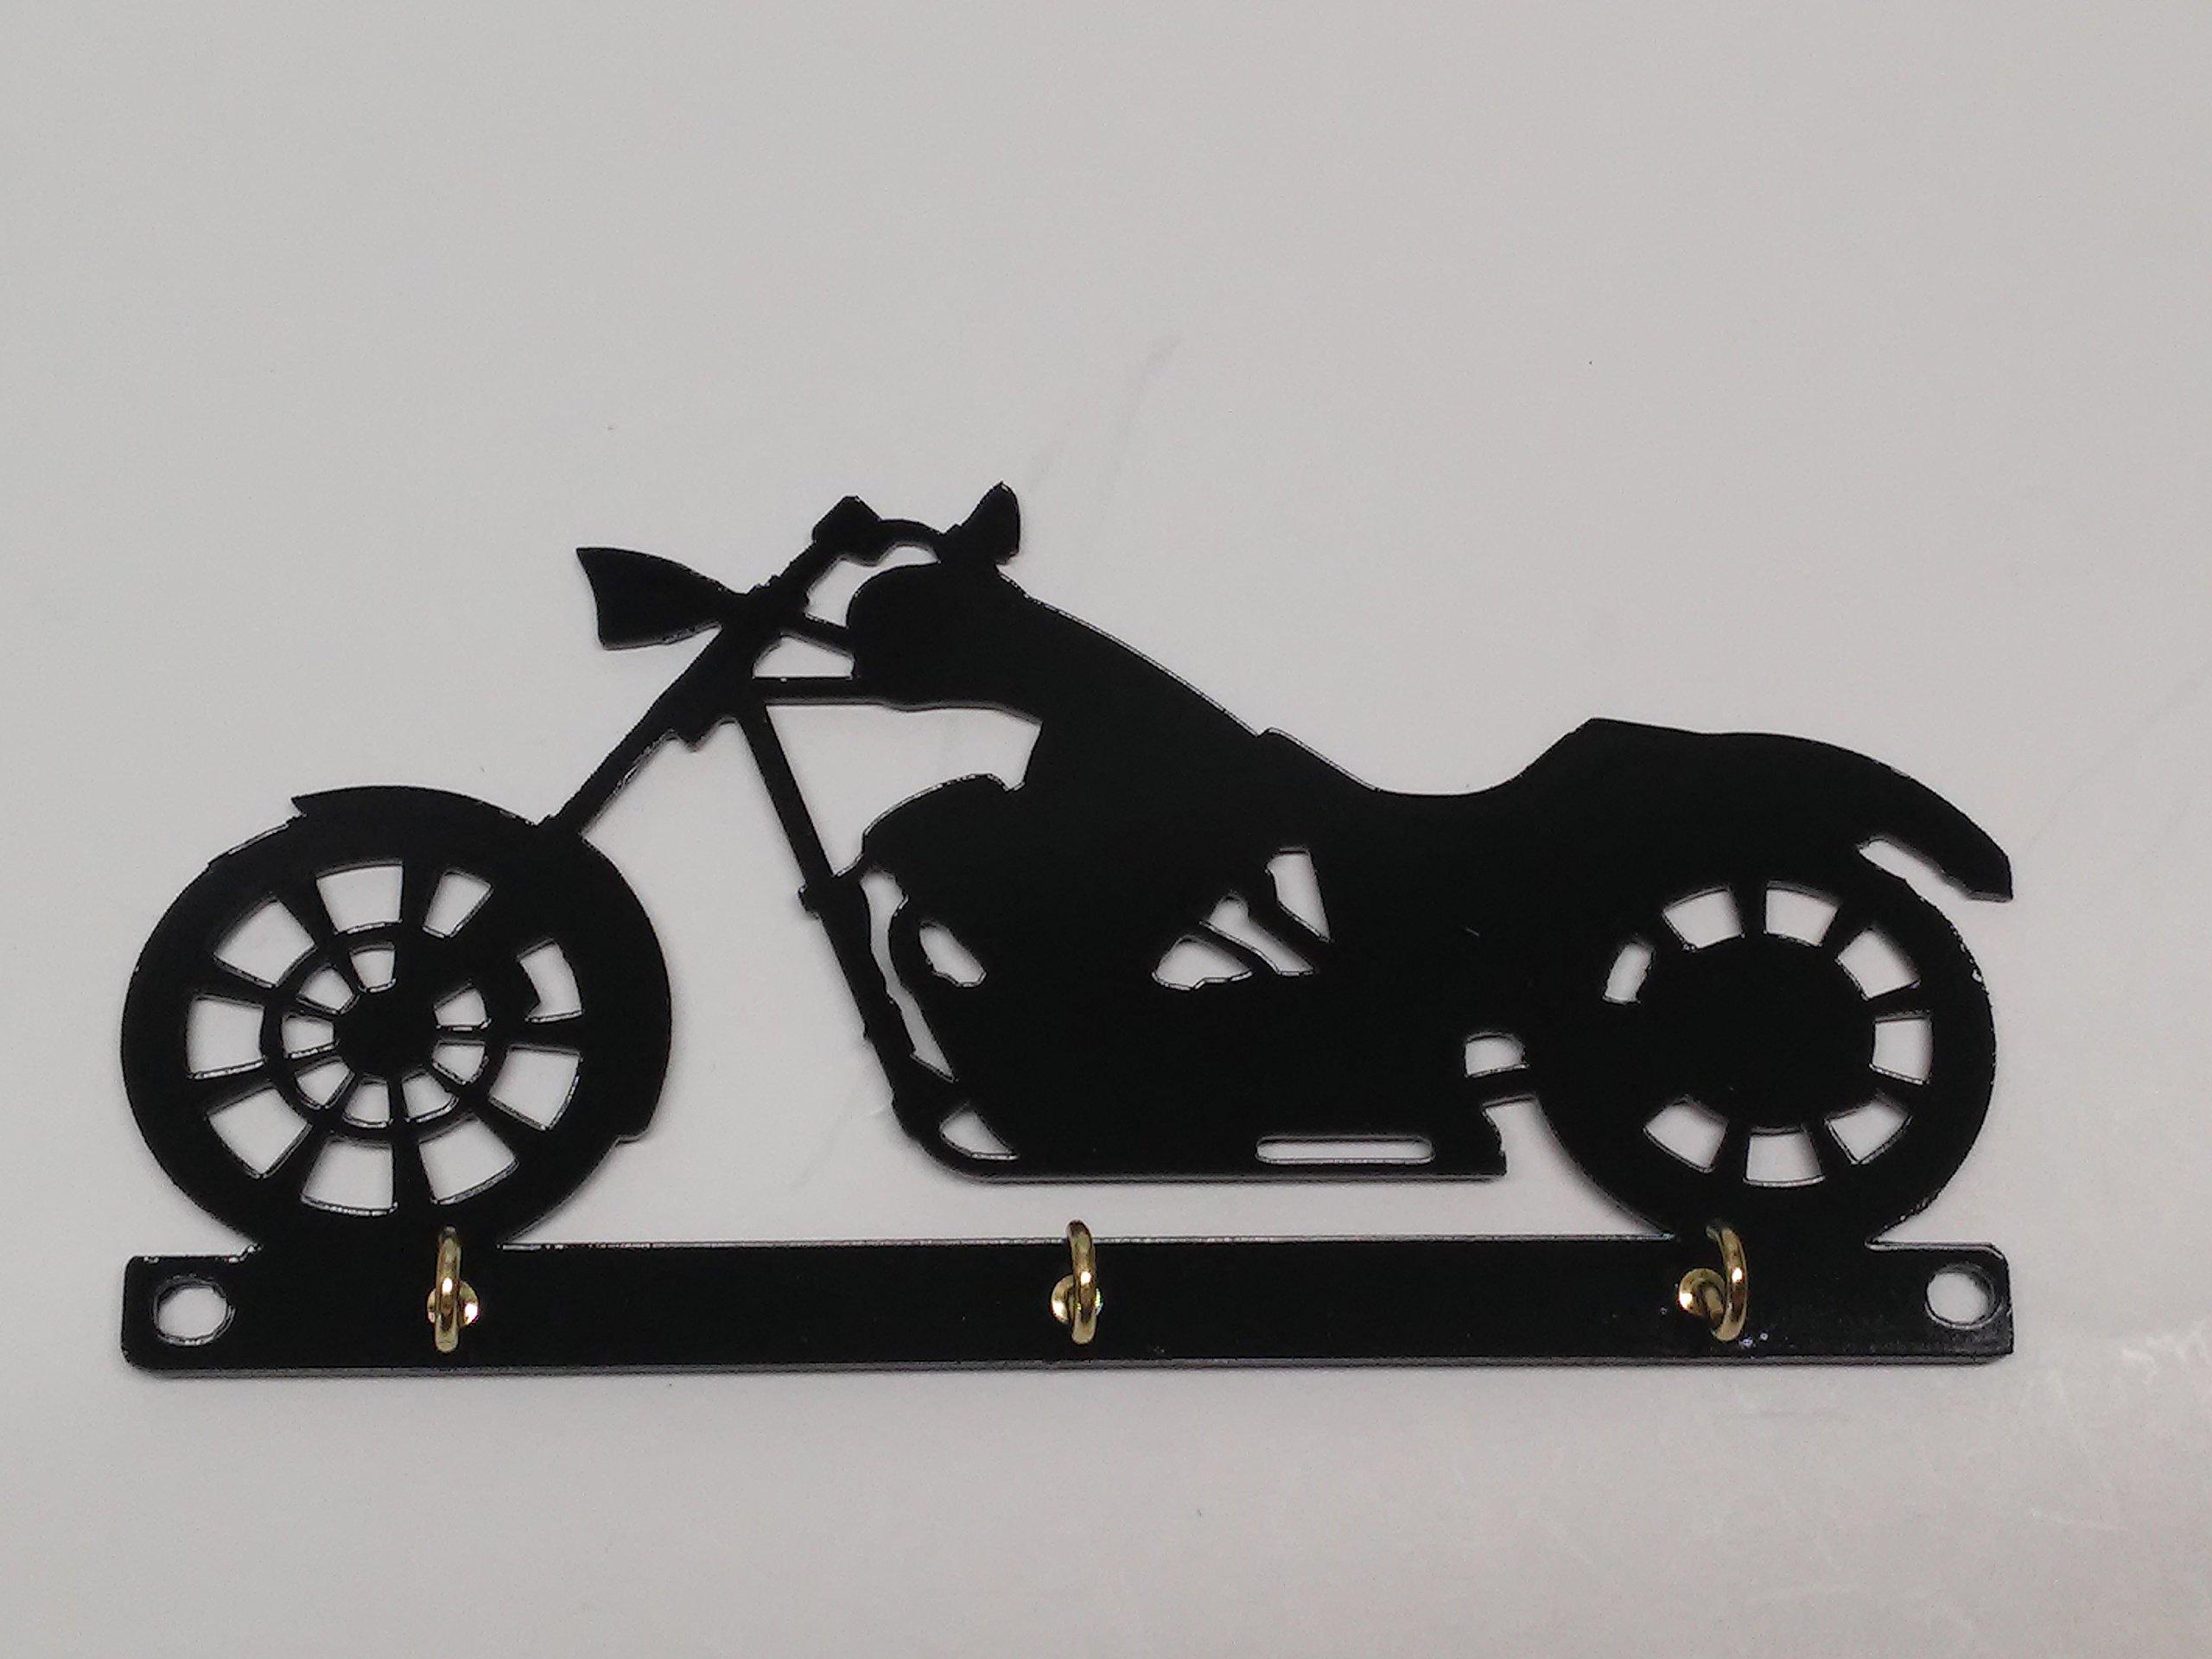 Chopper Motorcycle Key Holder Rack Hook Organizer Wall Mounted by Cycle Key Racks (Image #1)